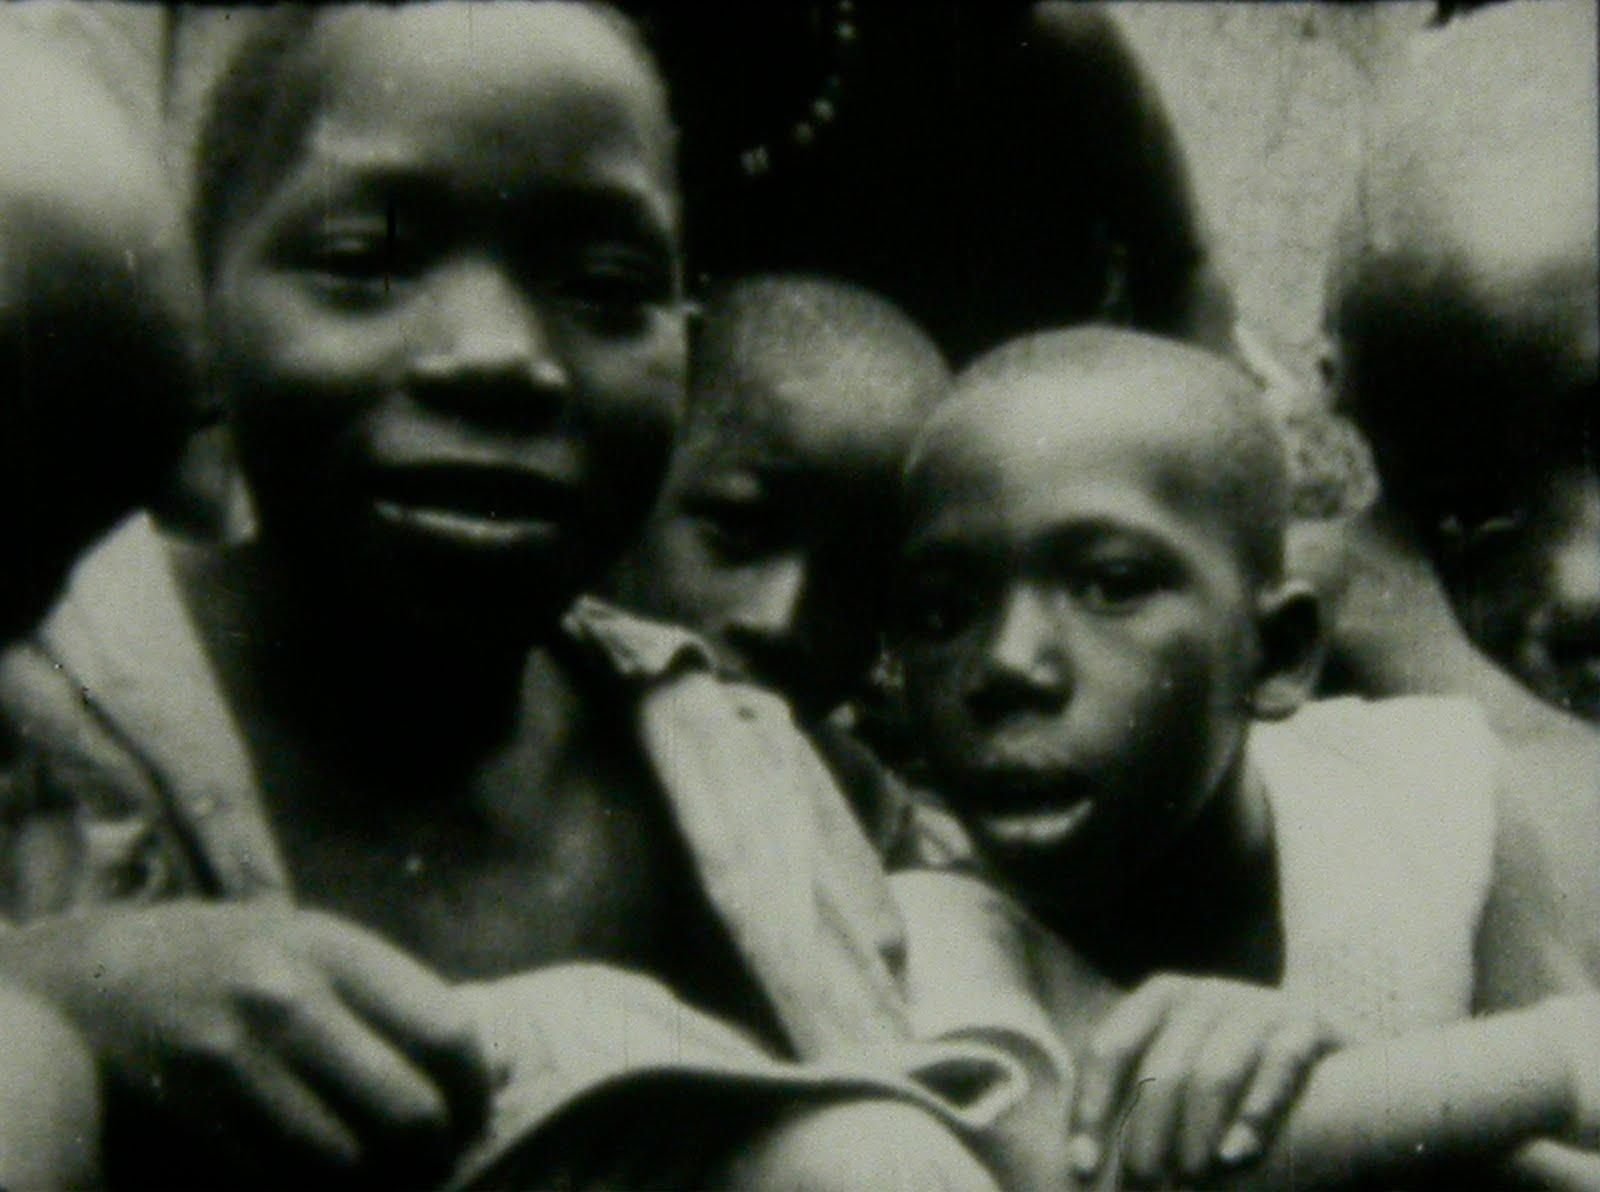 image_afrique_50-small.jpg